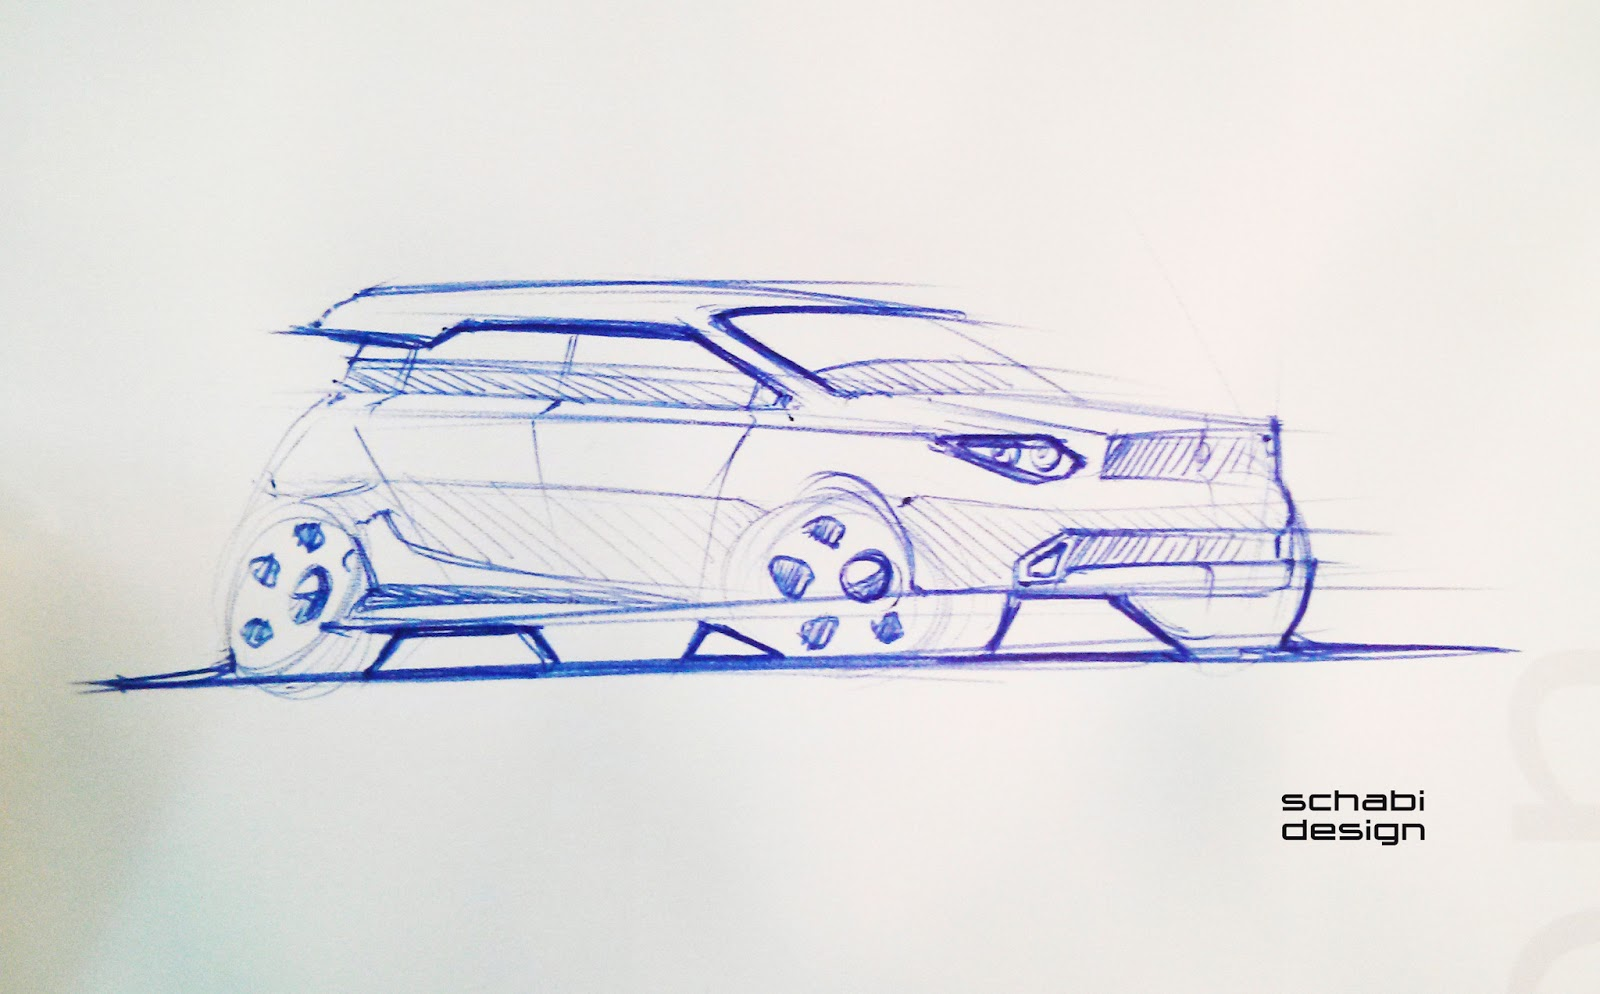 Schabi Design Sketch Site: SUV Car Sketch